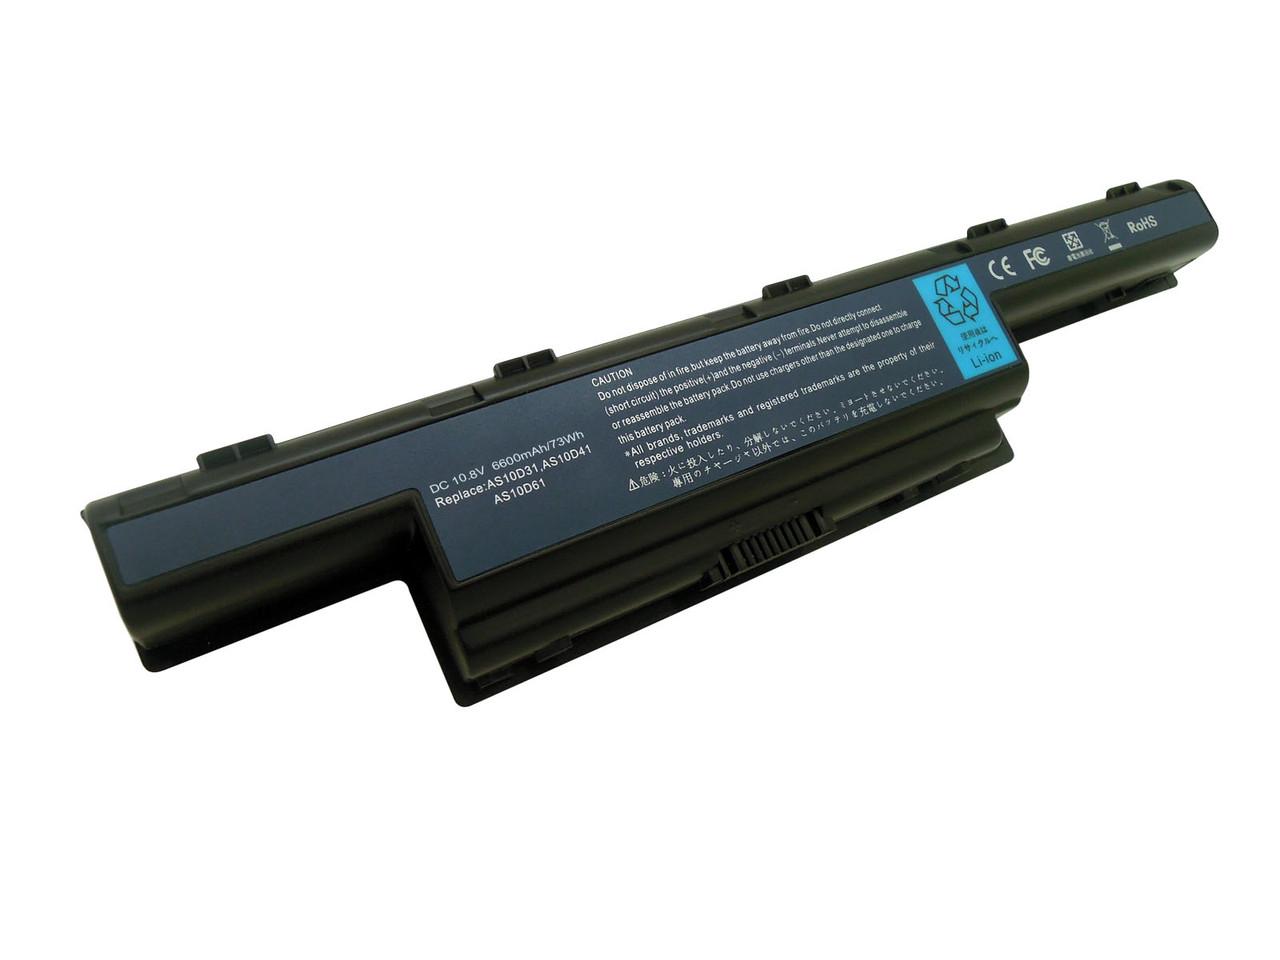 Аккумулятор для ноутбука ACER TravelMate TM5740-X522OF